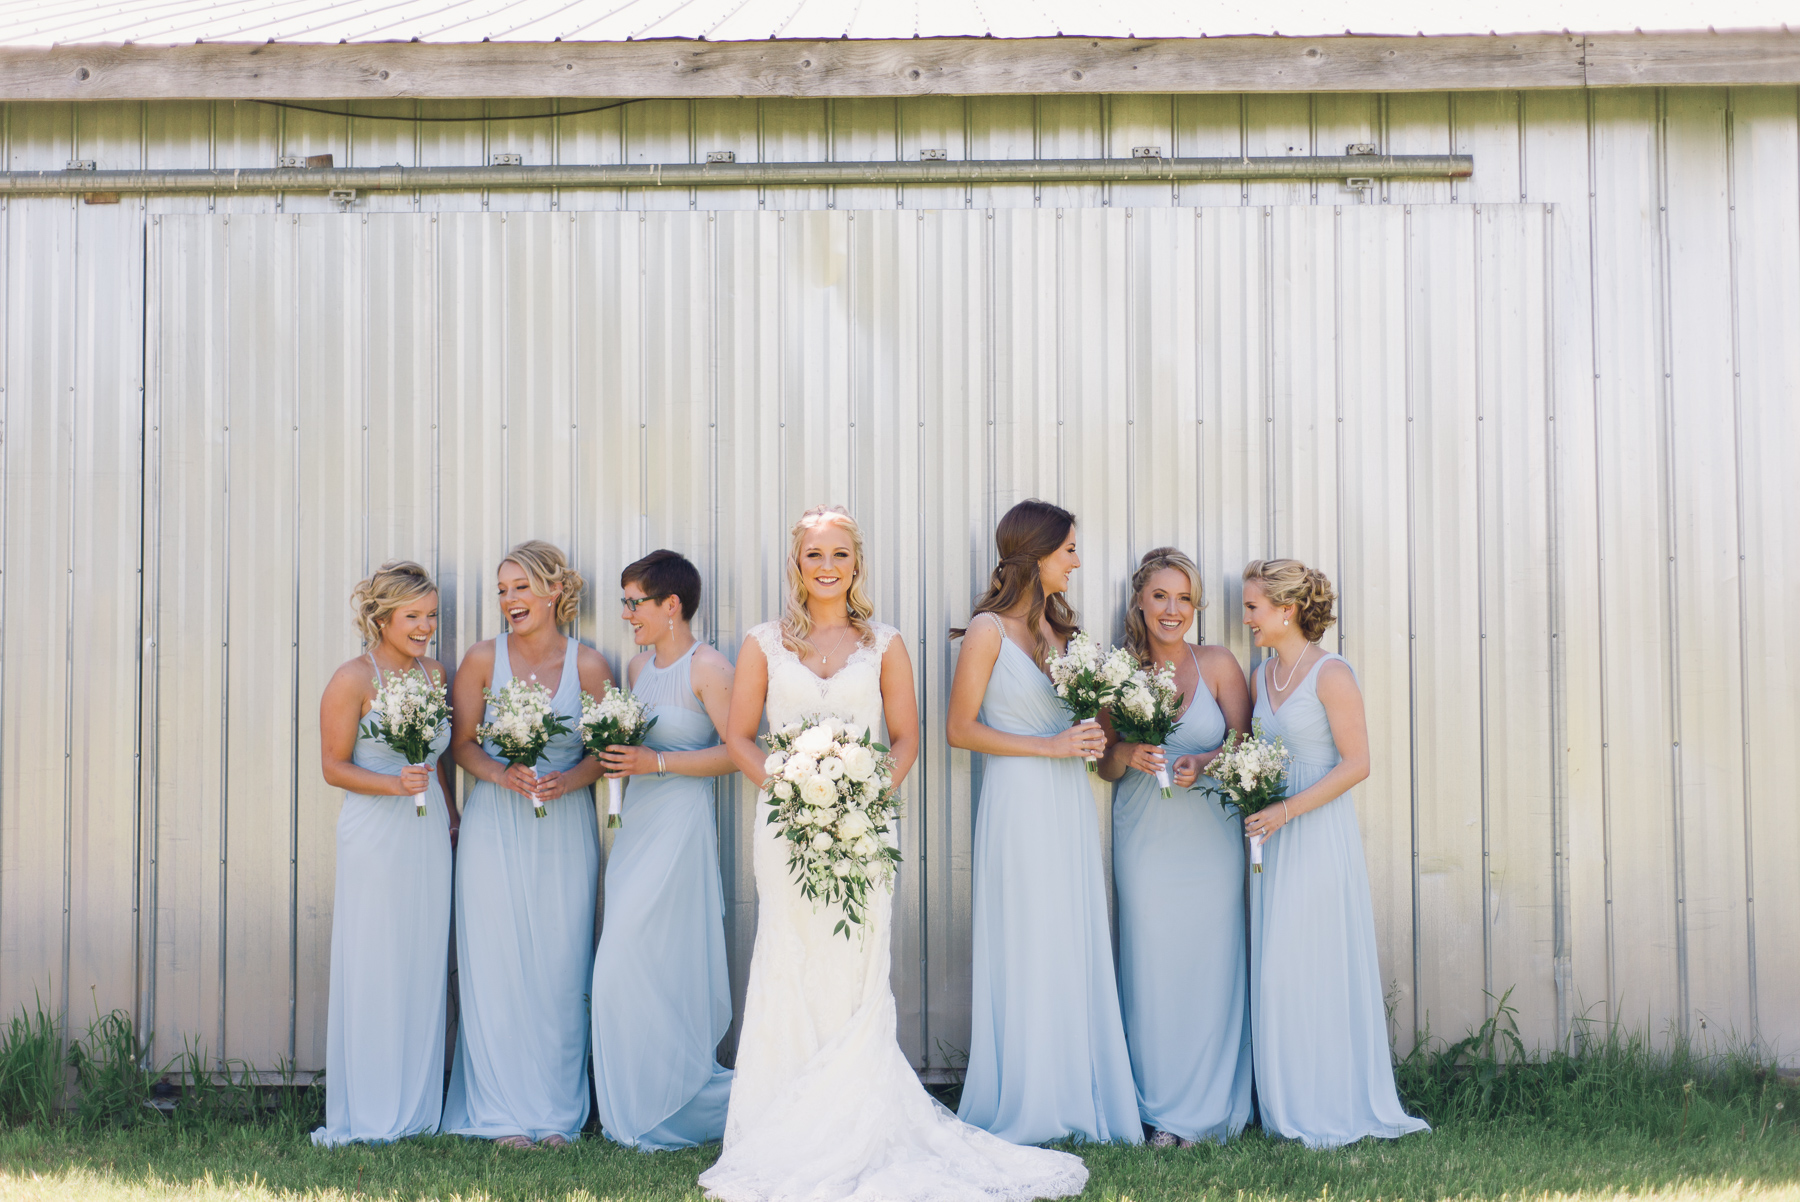 Kingston Wedding_Alabaster Jar Photography (13 of 42).jpg